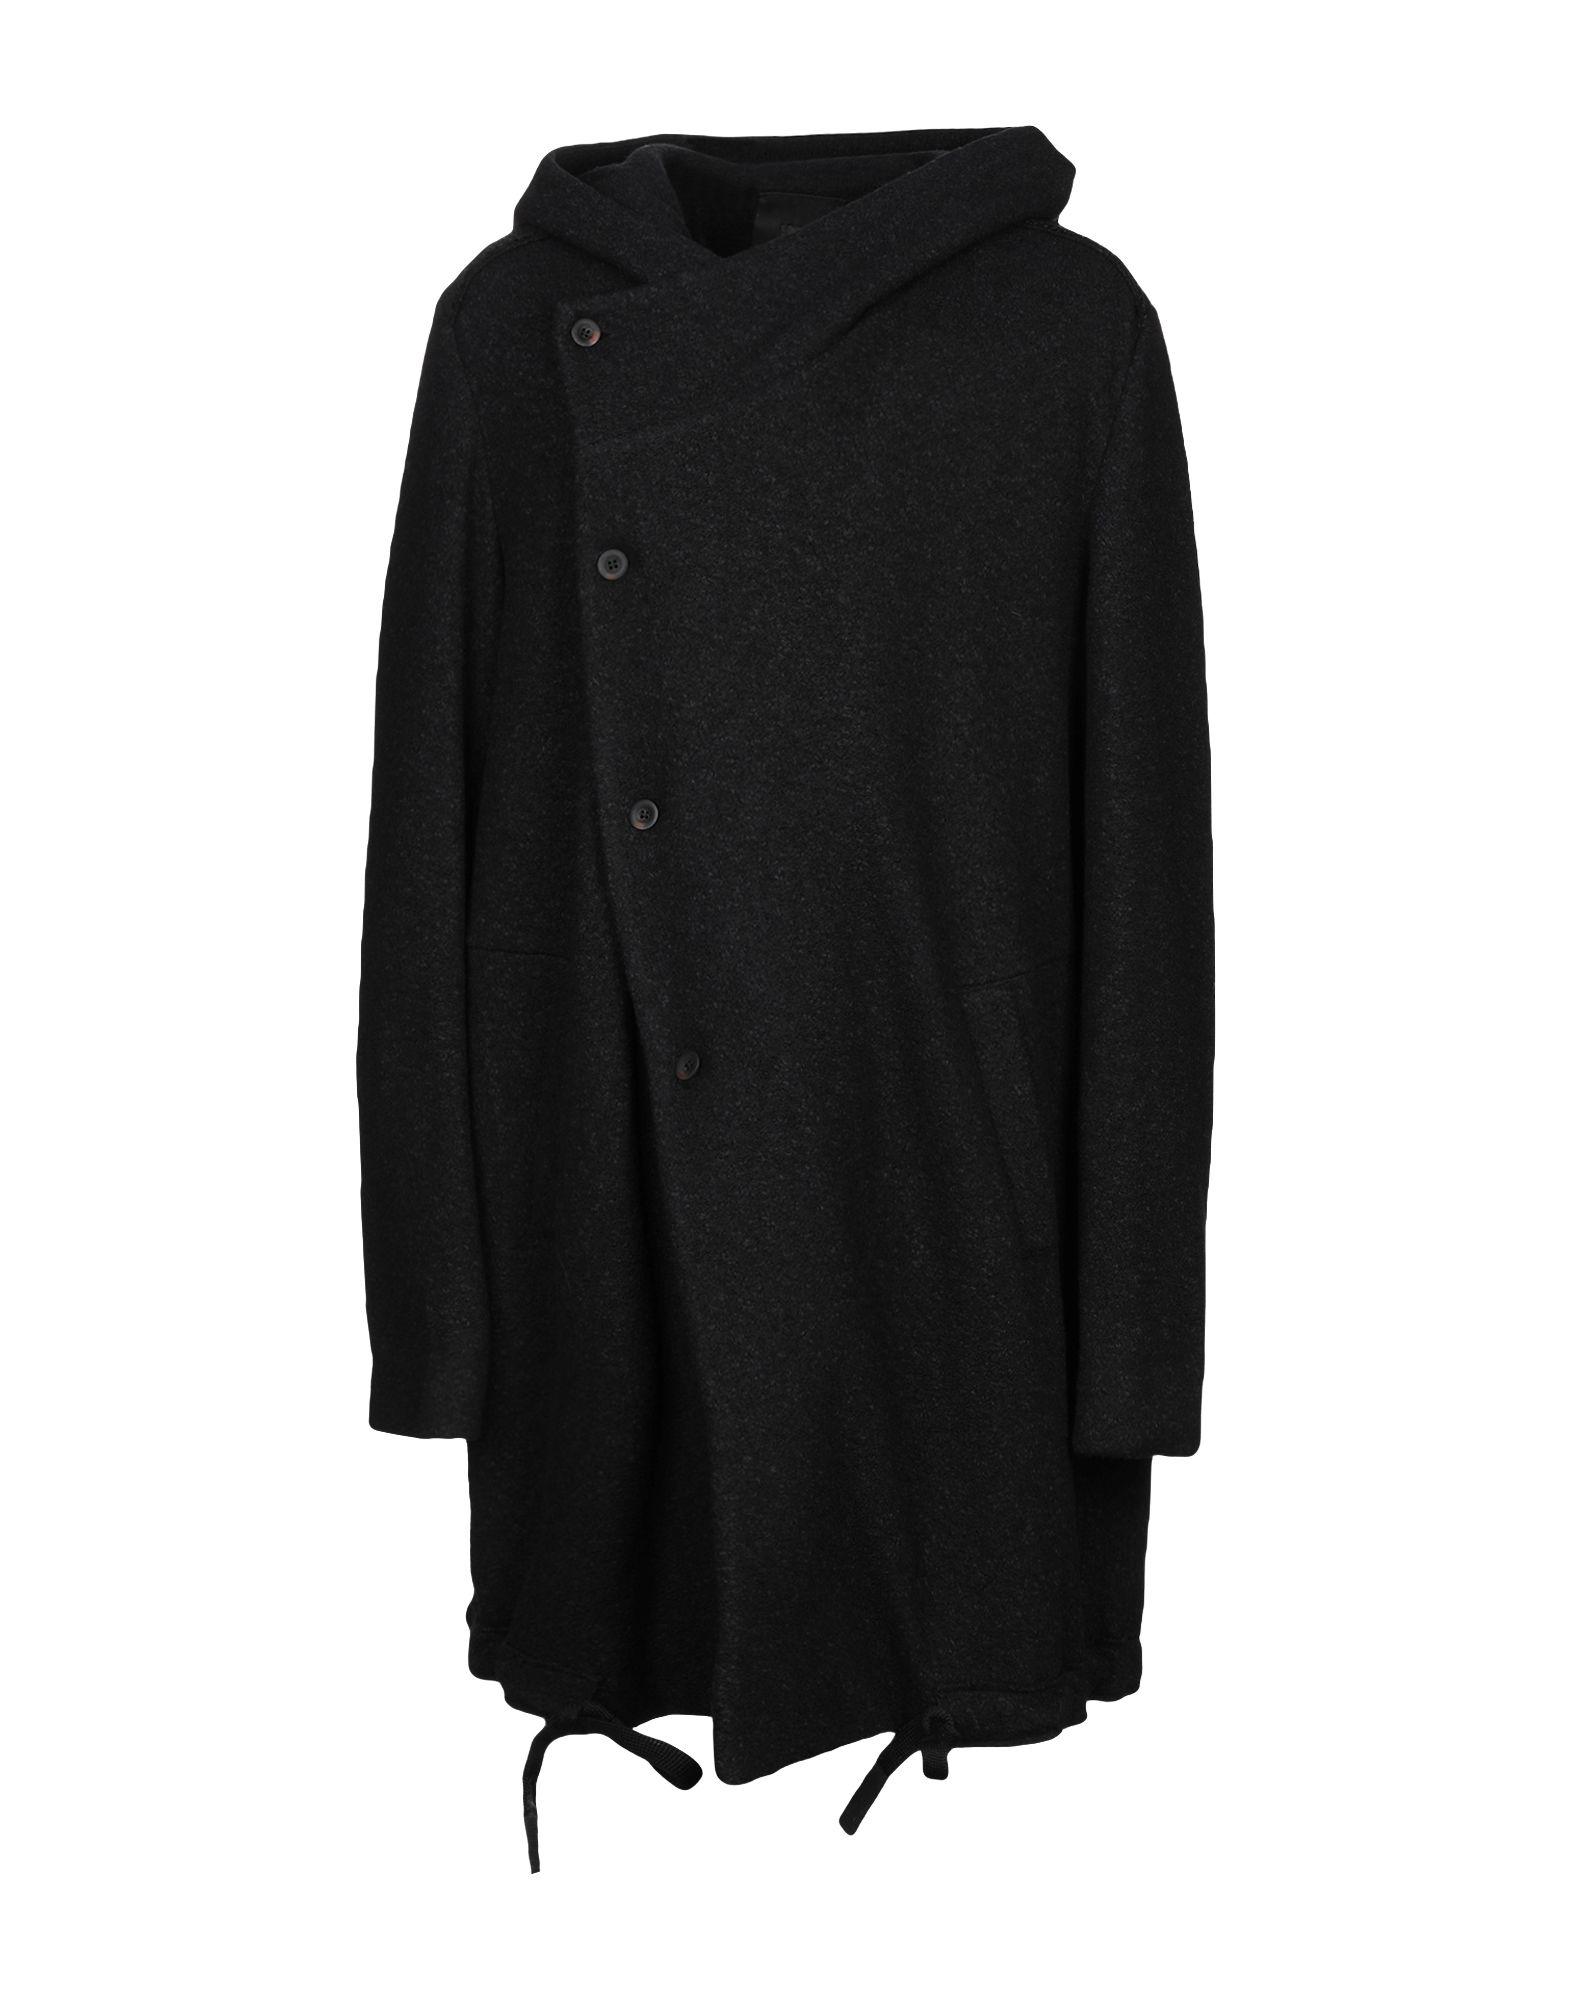 Фото - LOST & FOUND Пальто lost [in] me легкое пальто